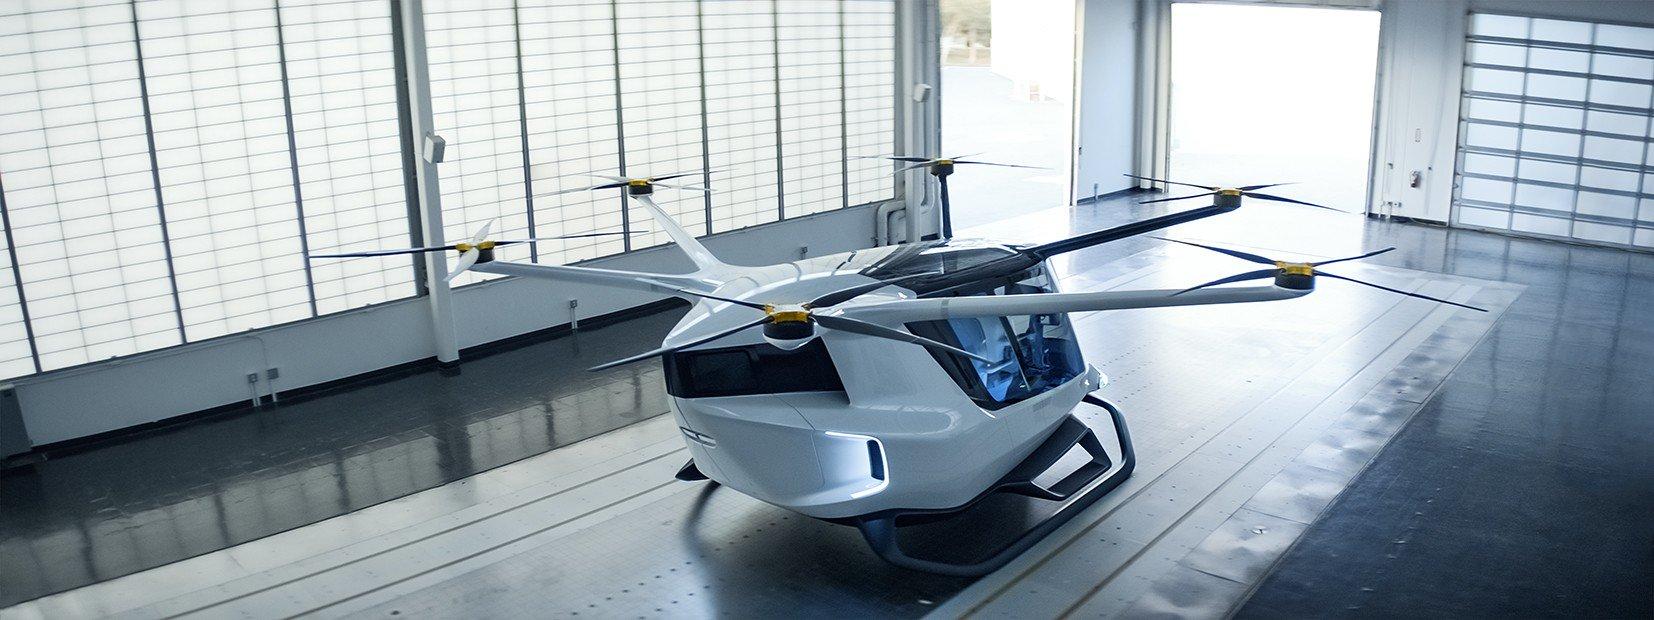 Alakai-Technologies-Skai-flying-car-3